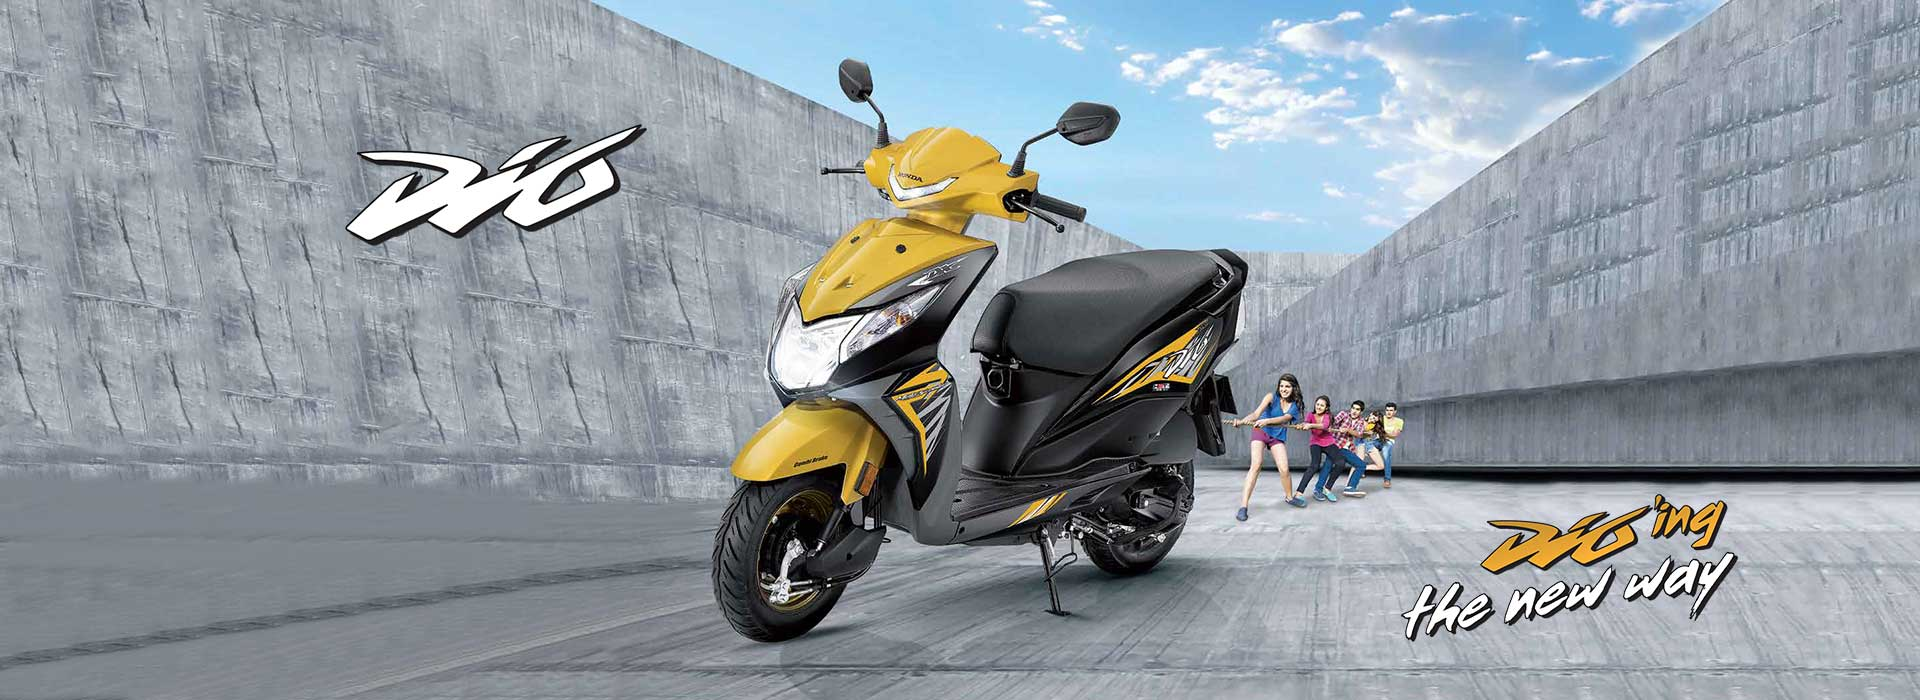 Jsp Honda Authorized Bike Dealership Serving And Servicing In